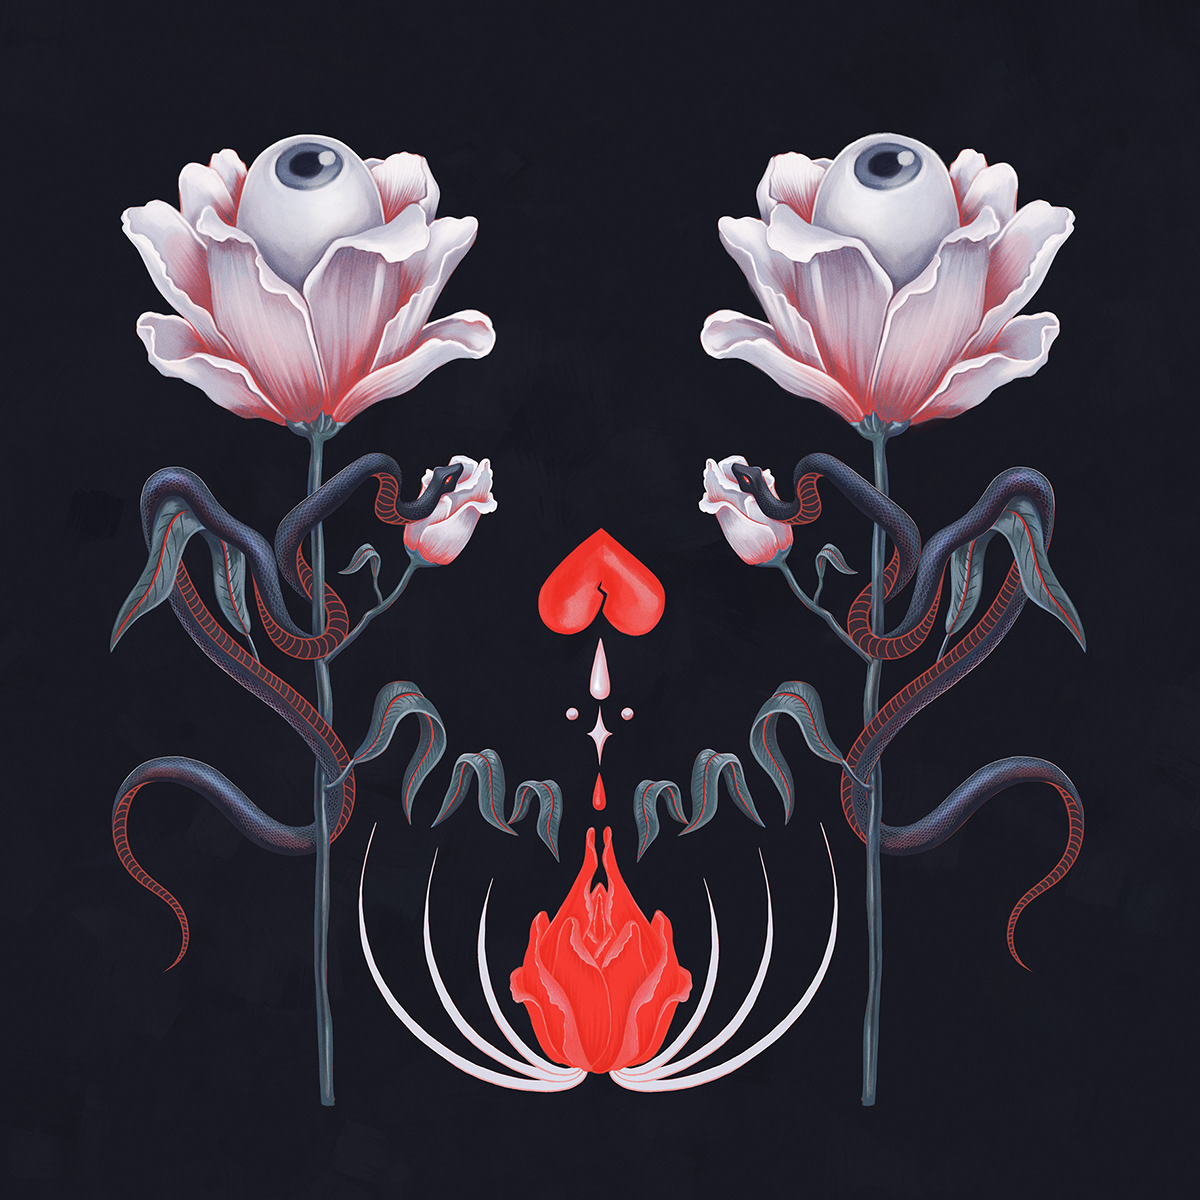 plants vegetation Plant Illustration Nature insect flower night fantasy surreal